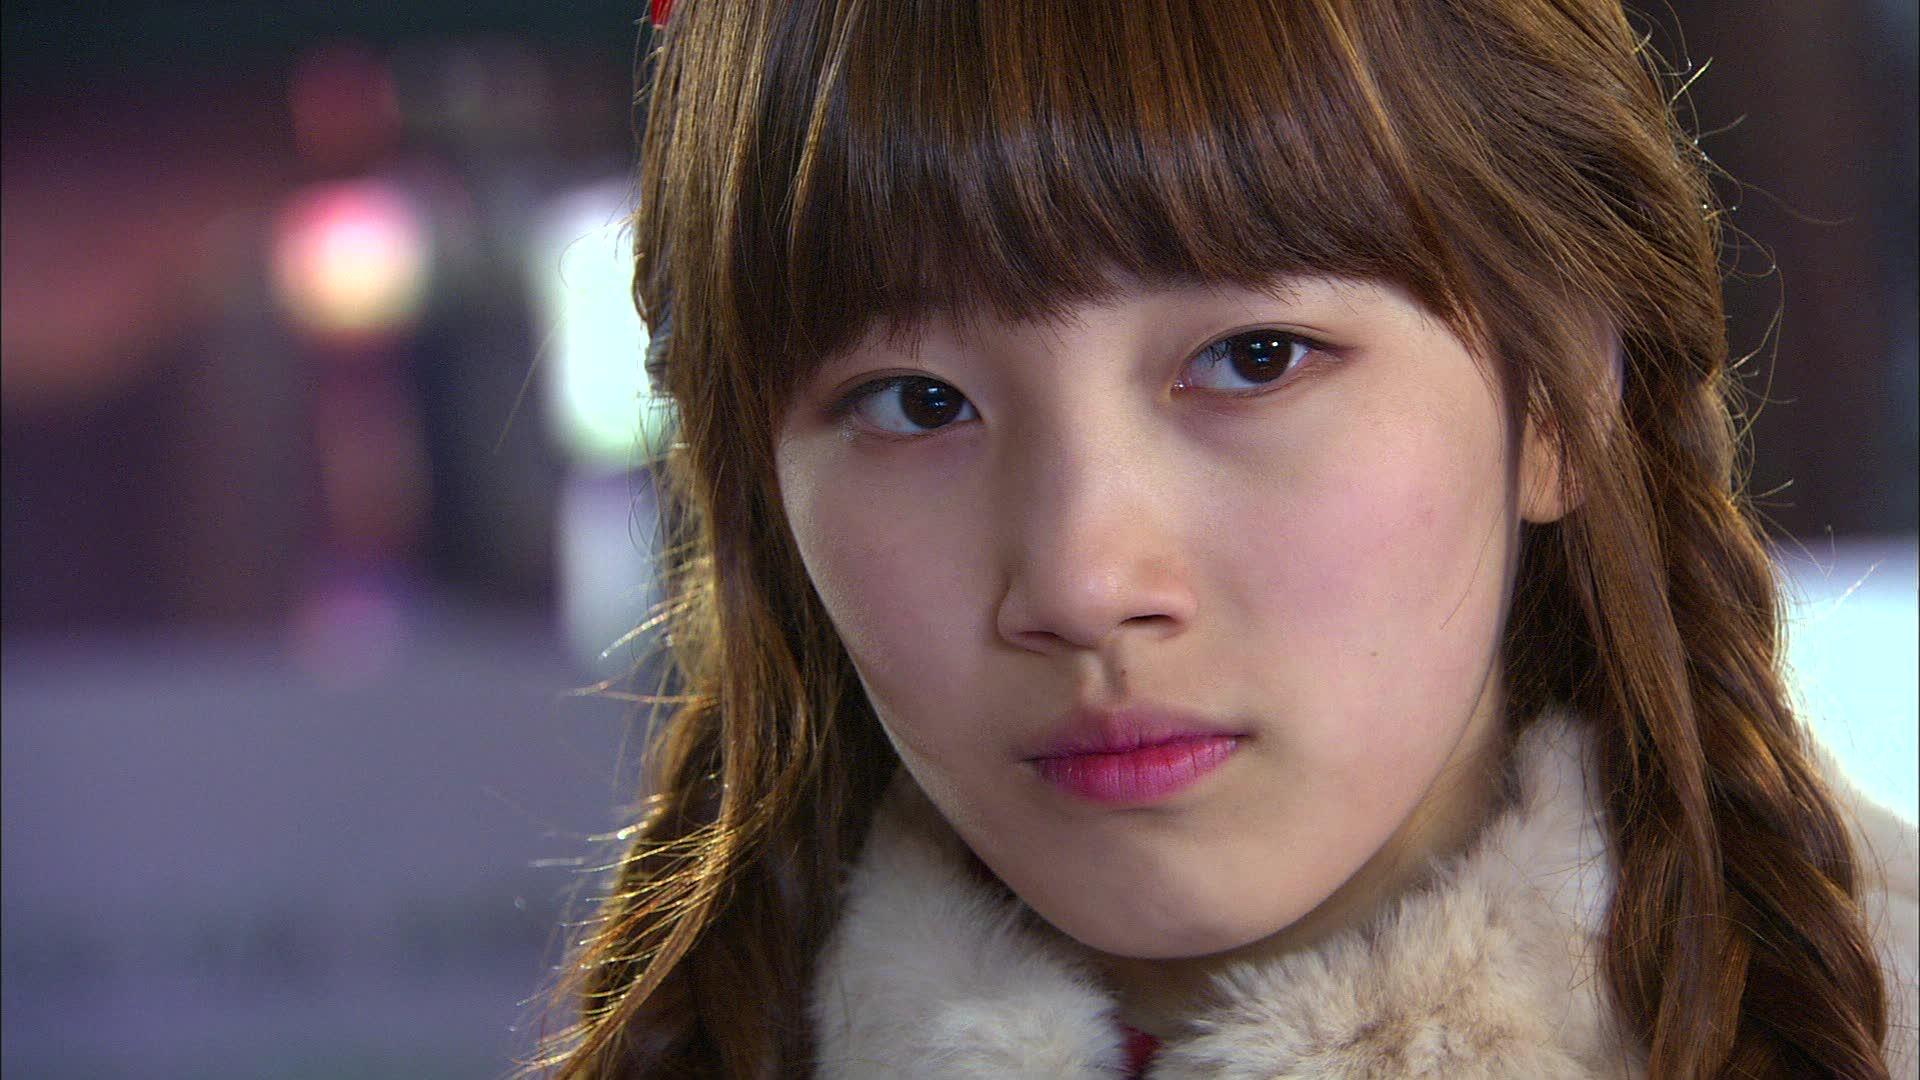 dream high episode 2 - 드림하이 - watch full episodes free - korea